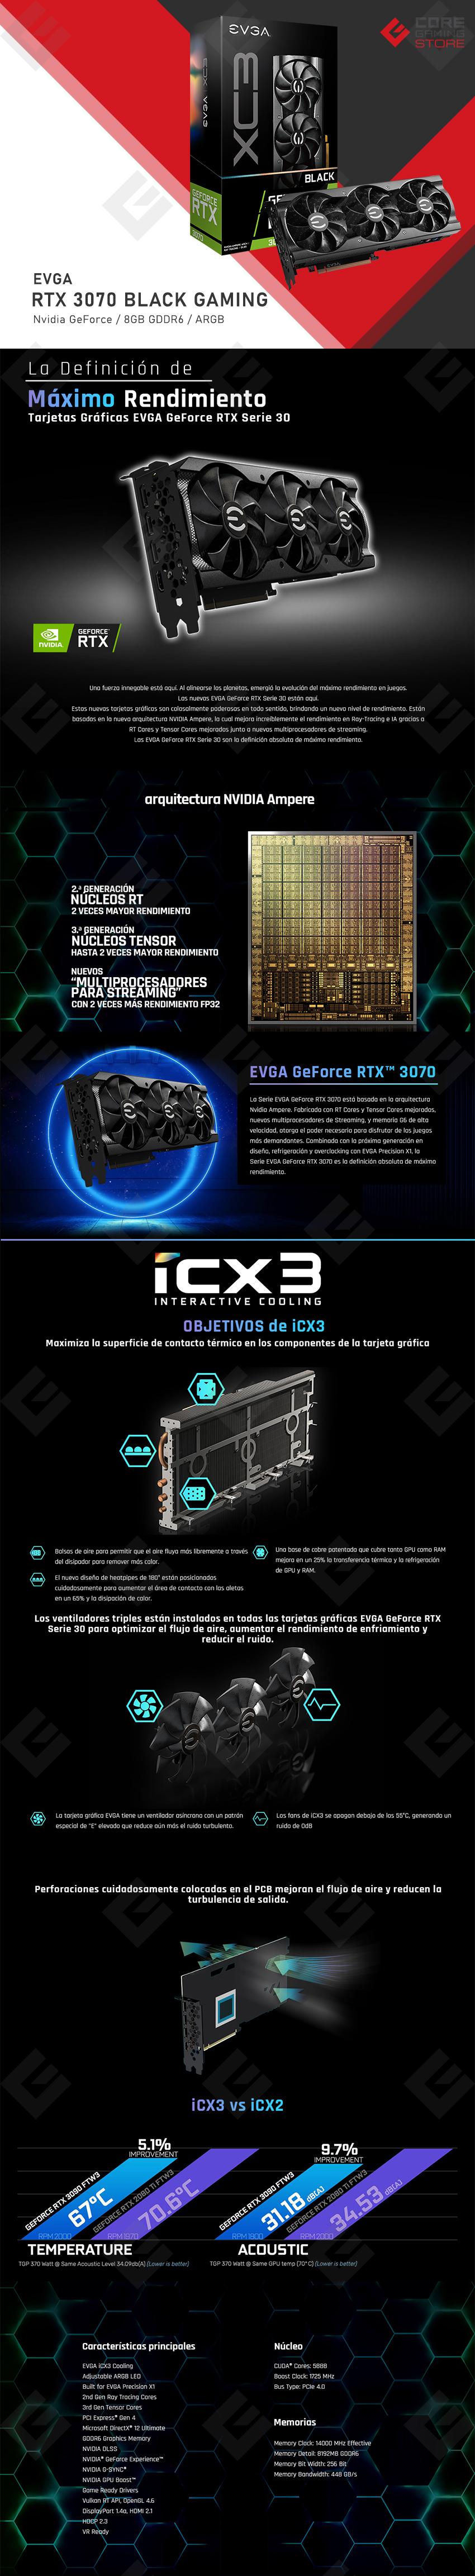 Tarjeta de Video Nvidia EVGA GeForce RTX 3070 XC3 Ultra Gaming, 8GB GDDR6, ARGB - 08G-P5-3755-KR  - (Venta exclusiva por transferencia electrónica o depósito bancario)